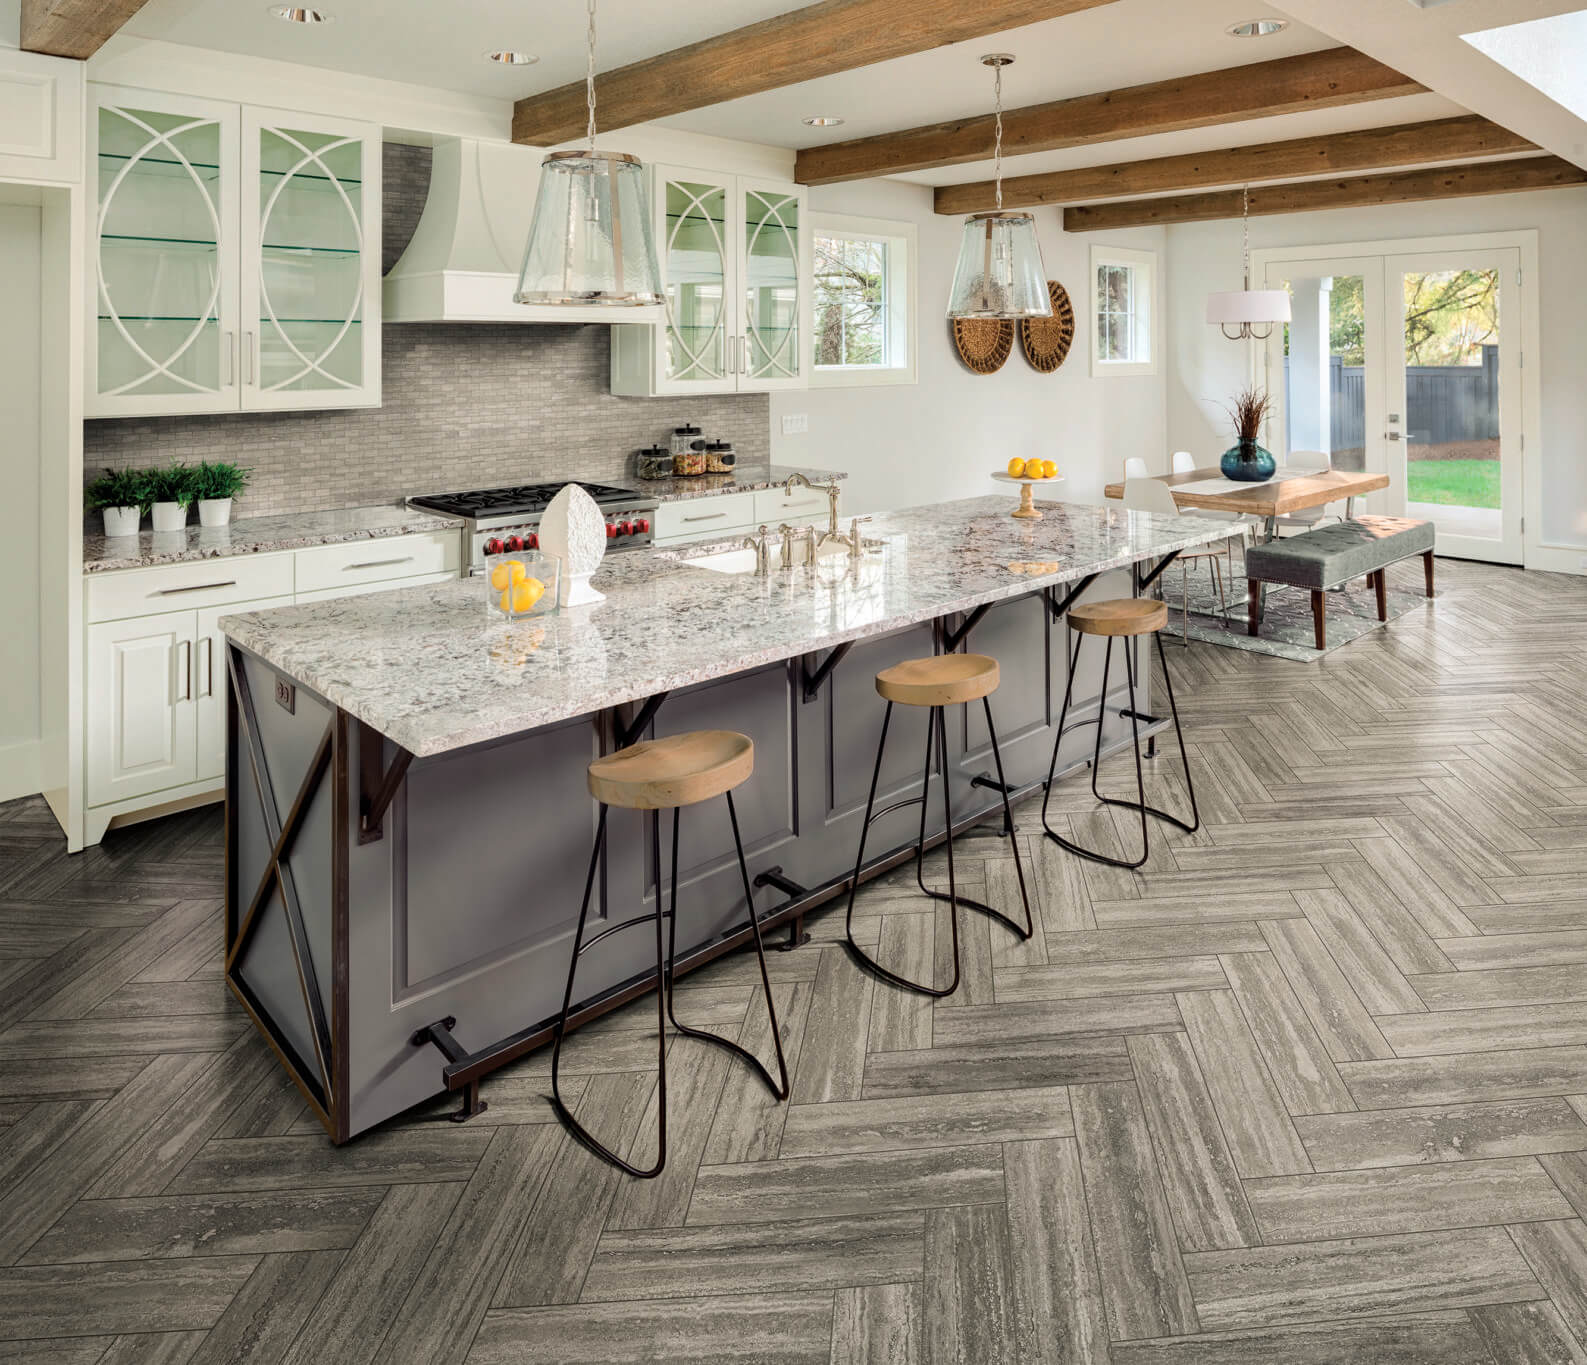 Wood-look mosaic tile kitchen backsplash in a running bond pattern